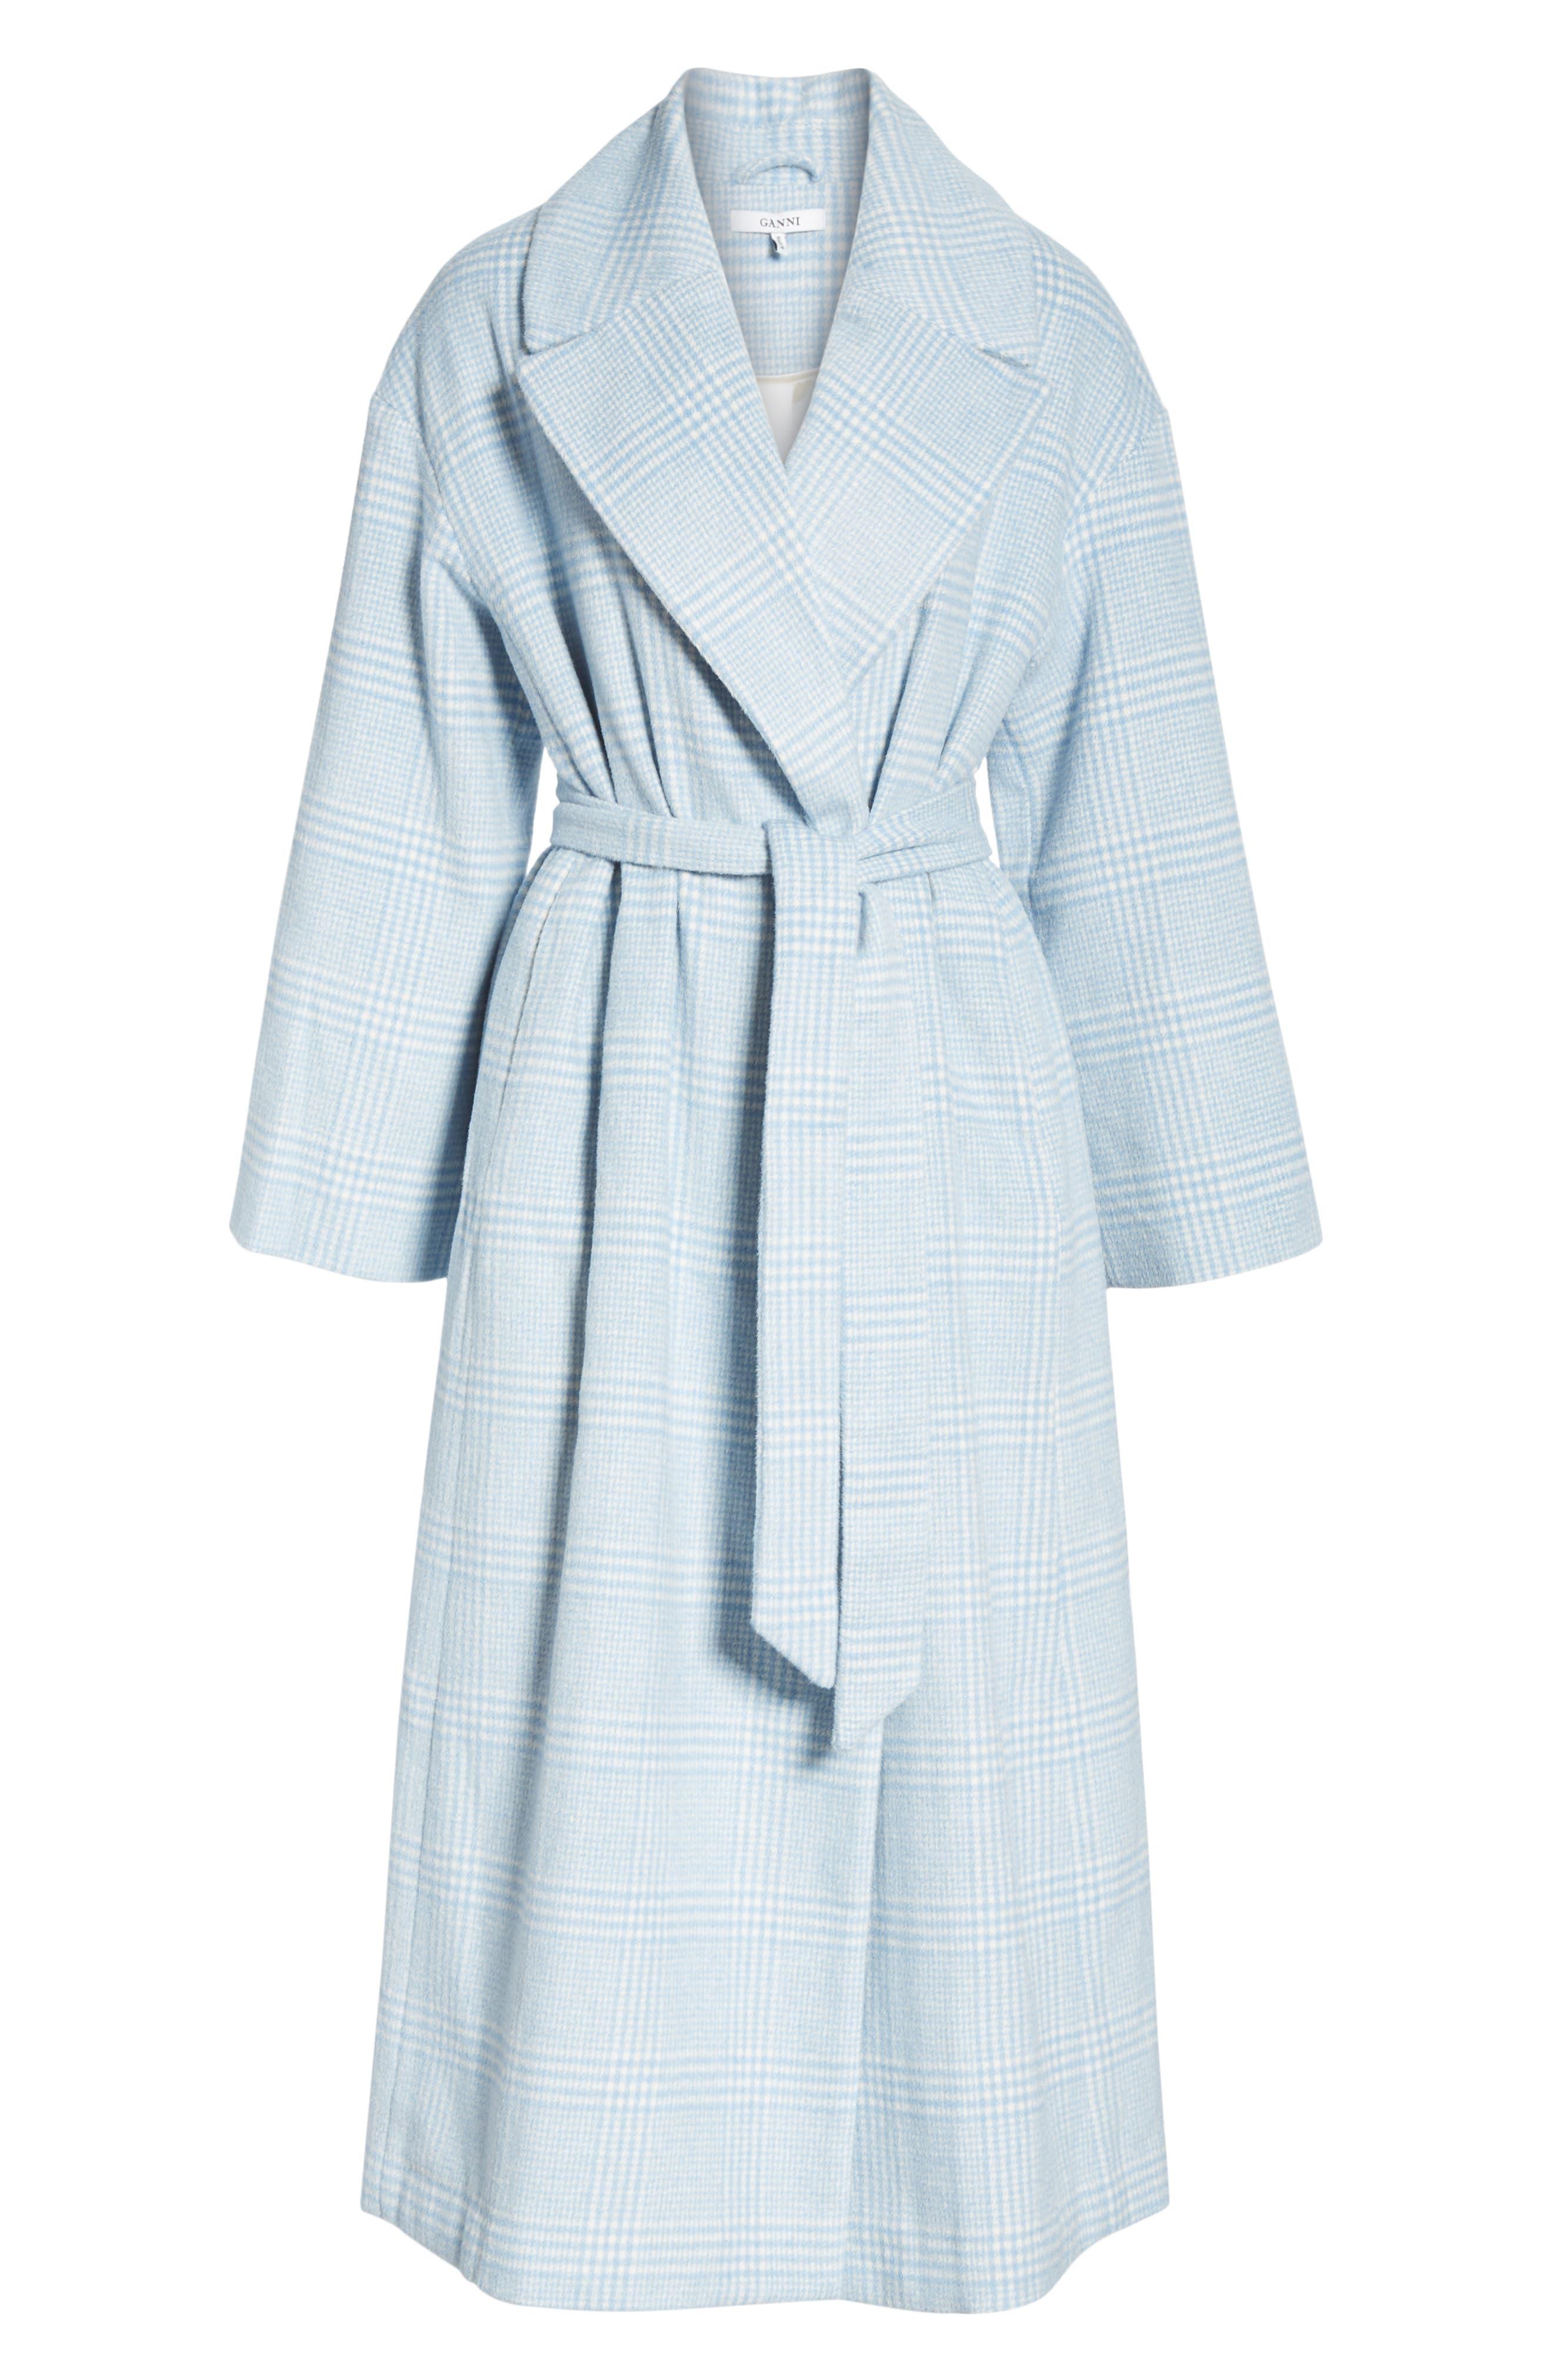 Woodside Coat,                             Alternate thumbnail 5, color,                             SERENITY BLUE